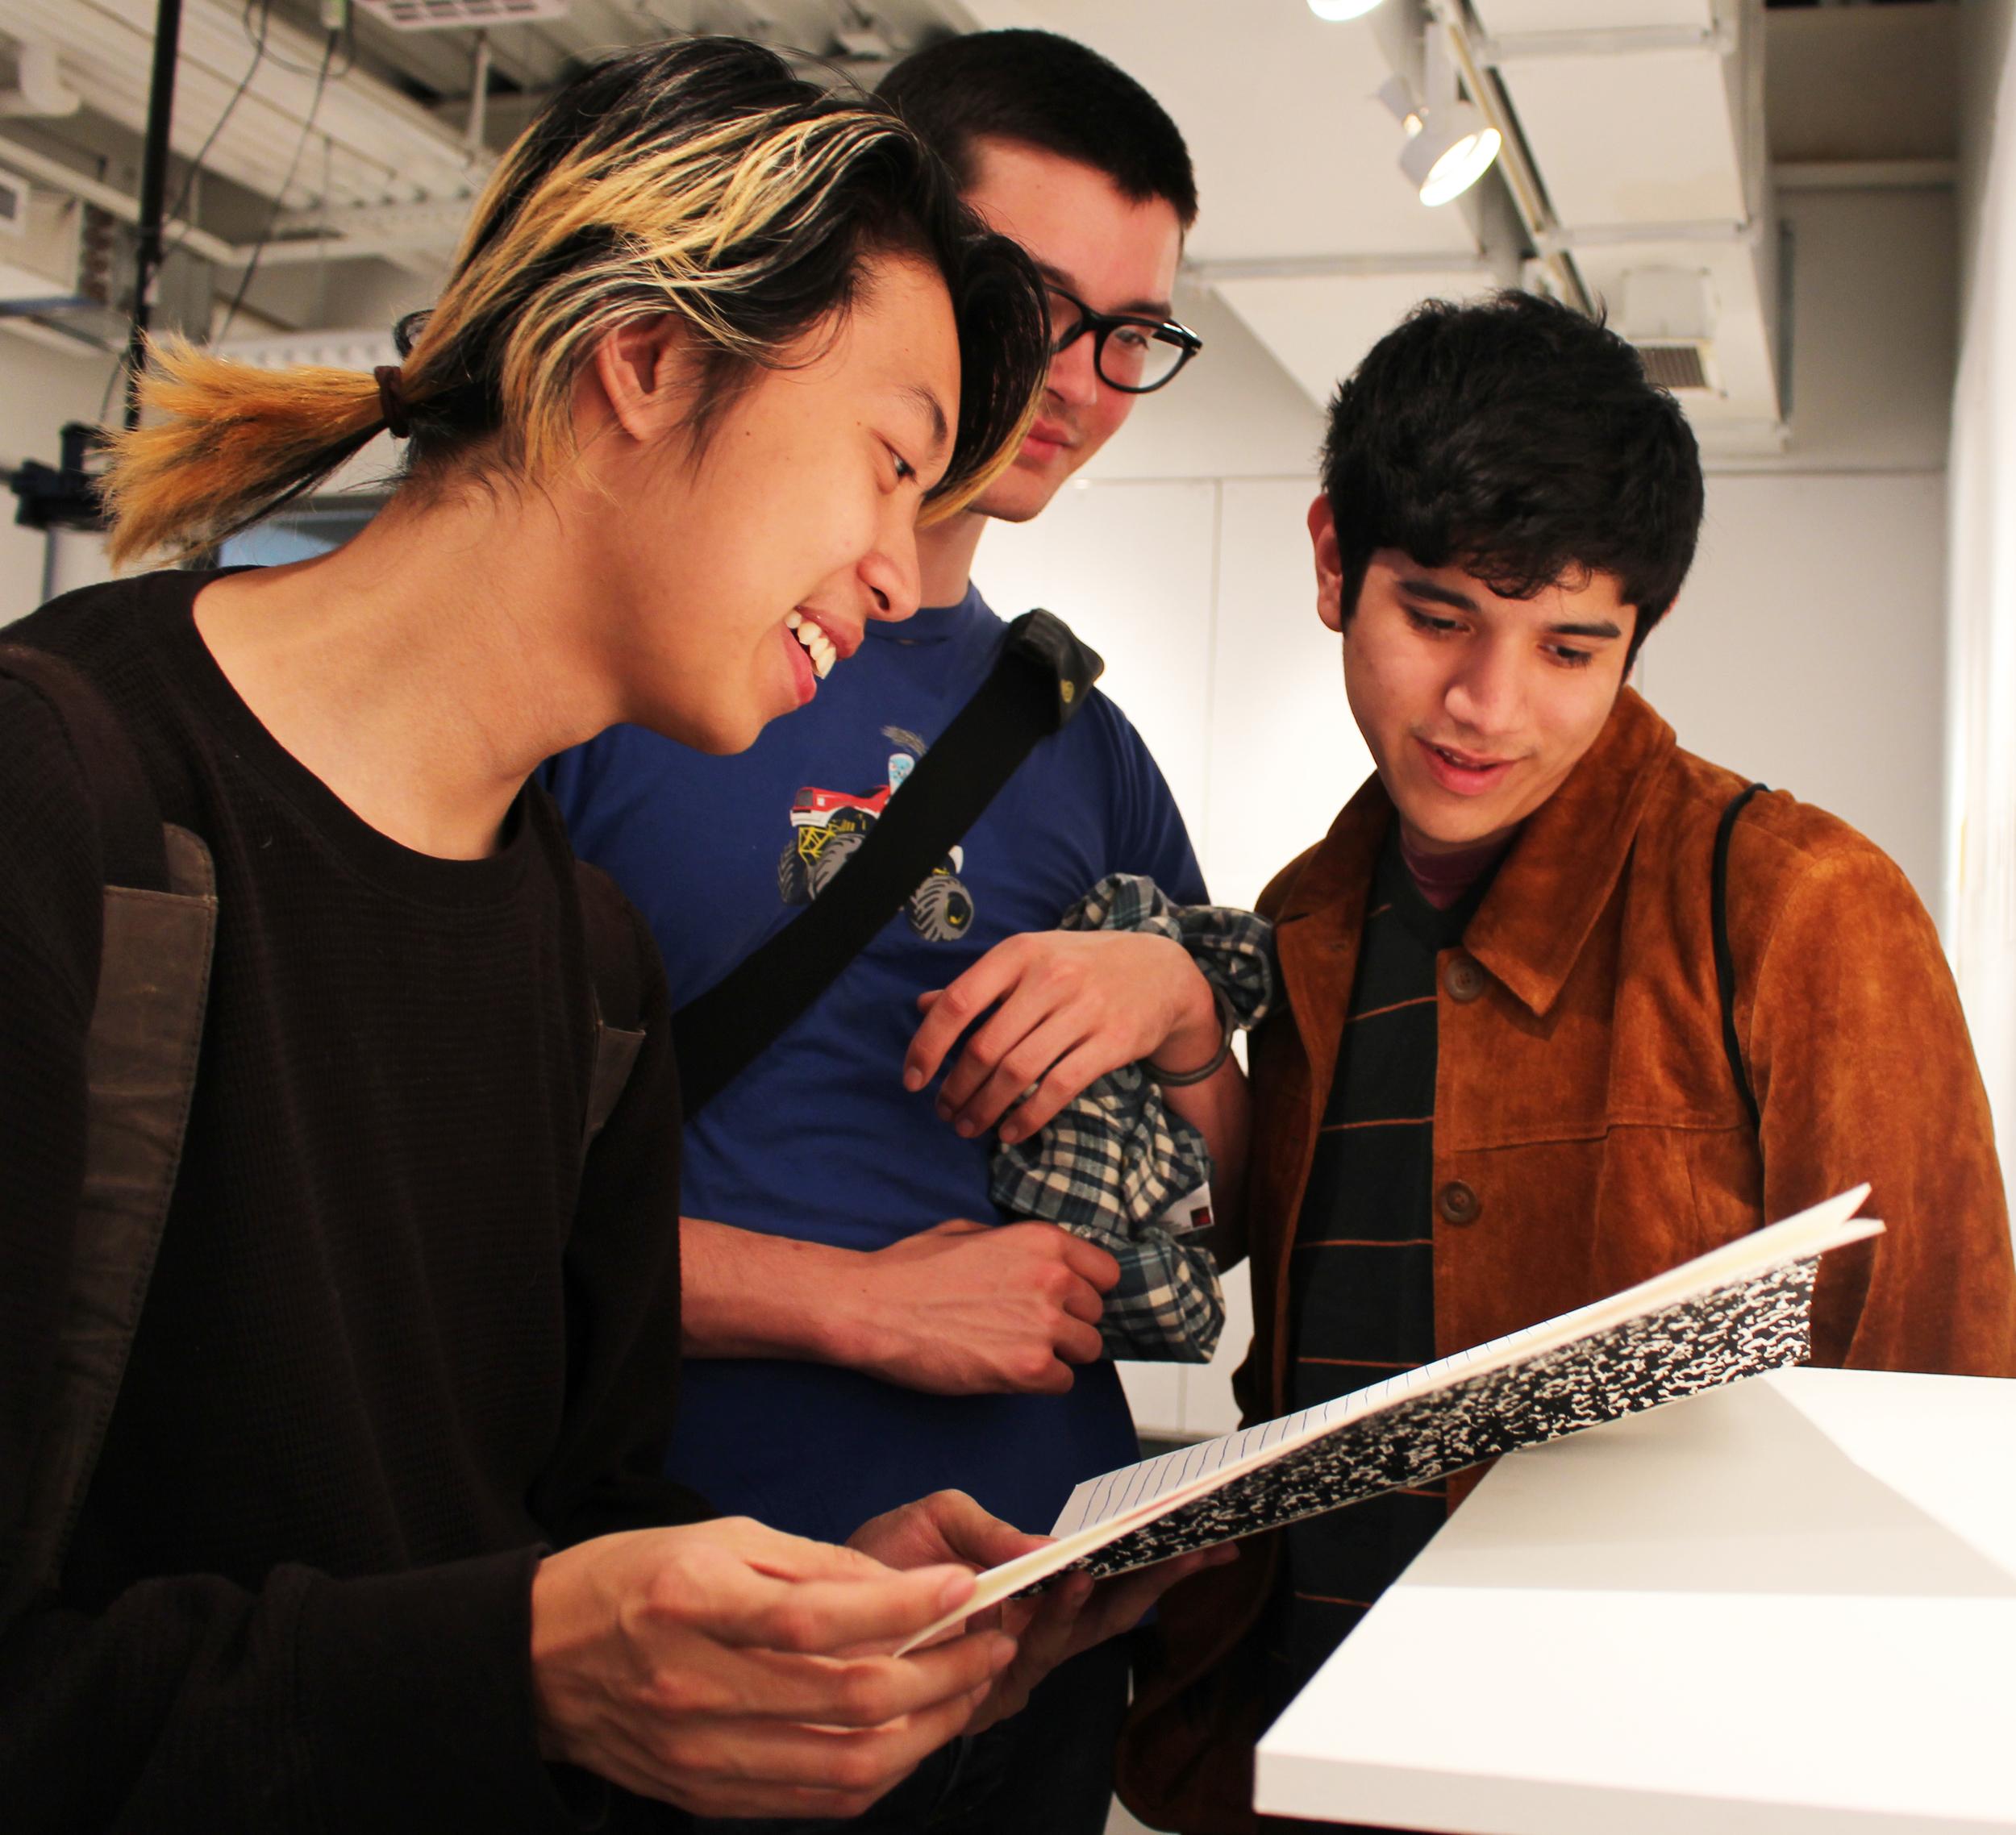 Tuyên Nguyễn '17, Jericho Walter-Roberts '17, and Kurt Santana '16 view student work